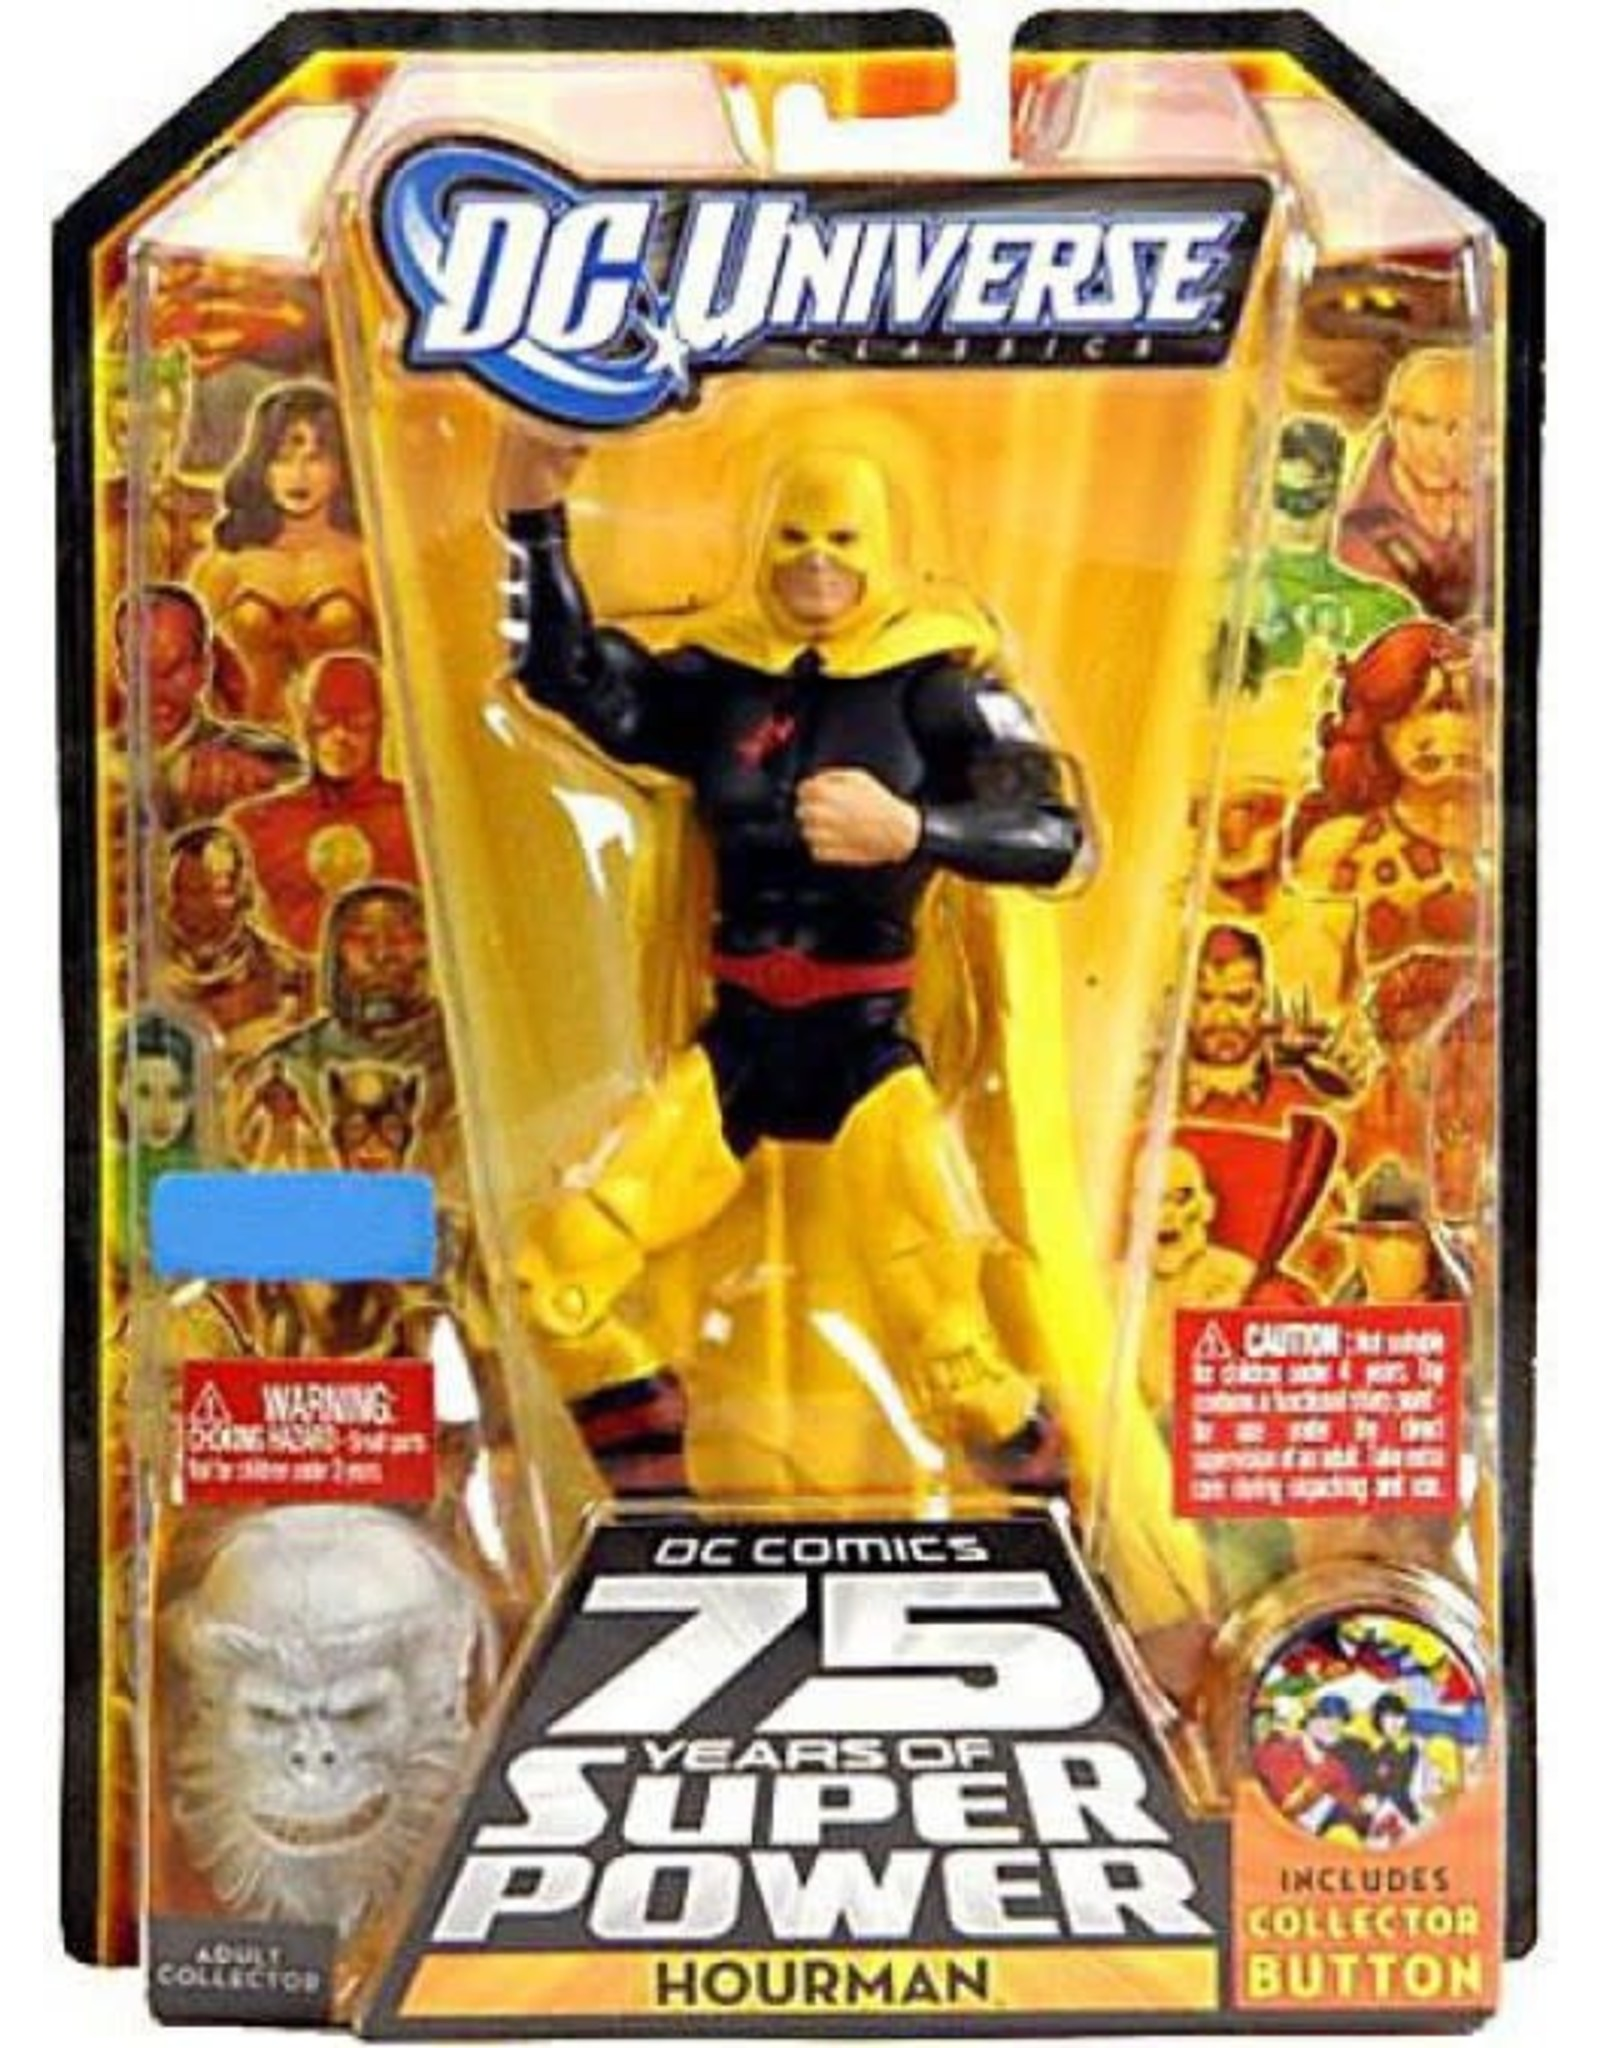 Mattel DC Universe Classics: DC Comics 75 Years of Super